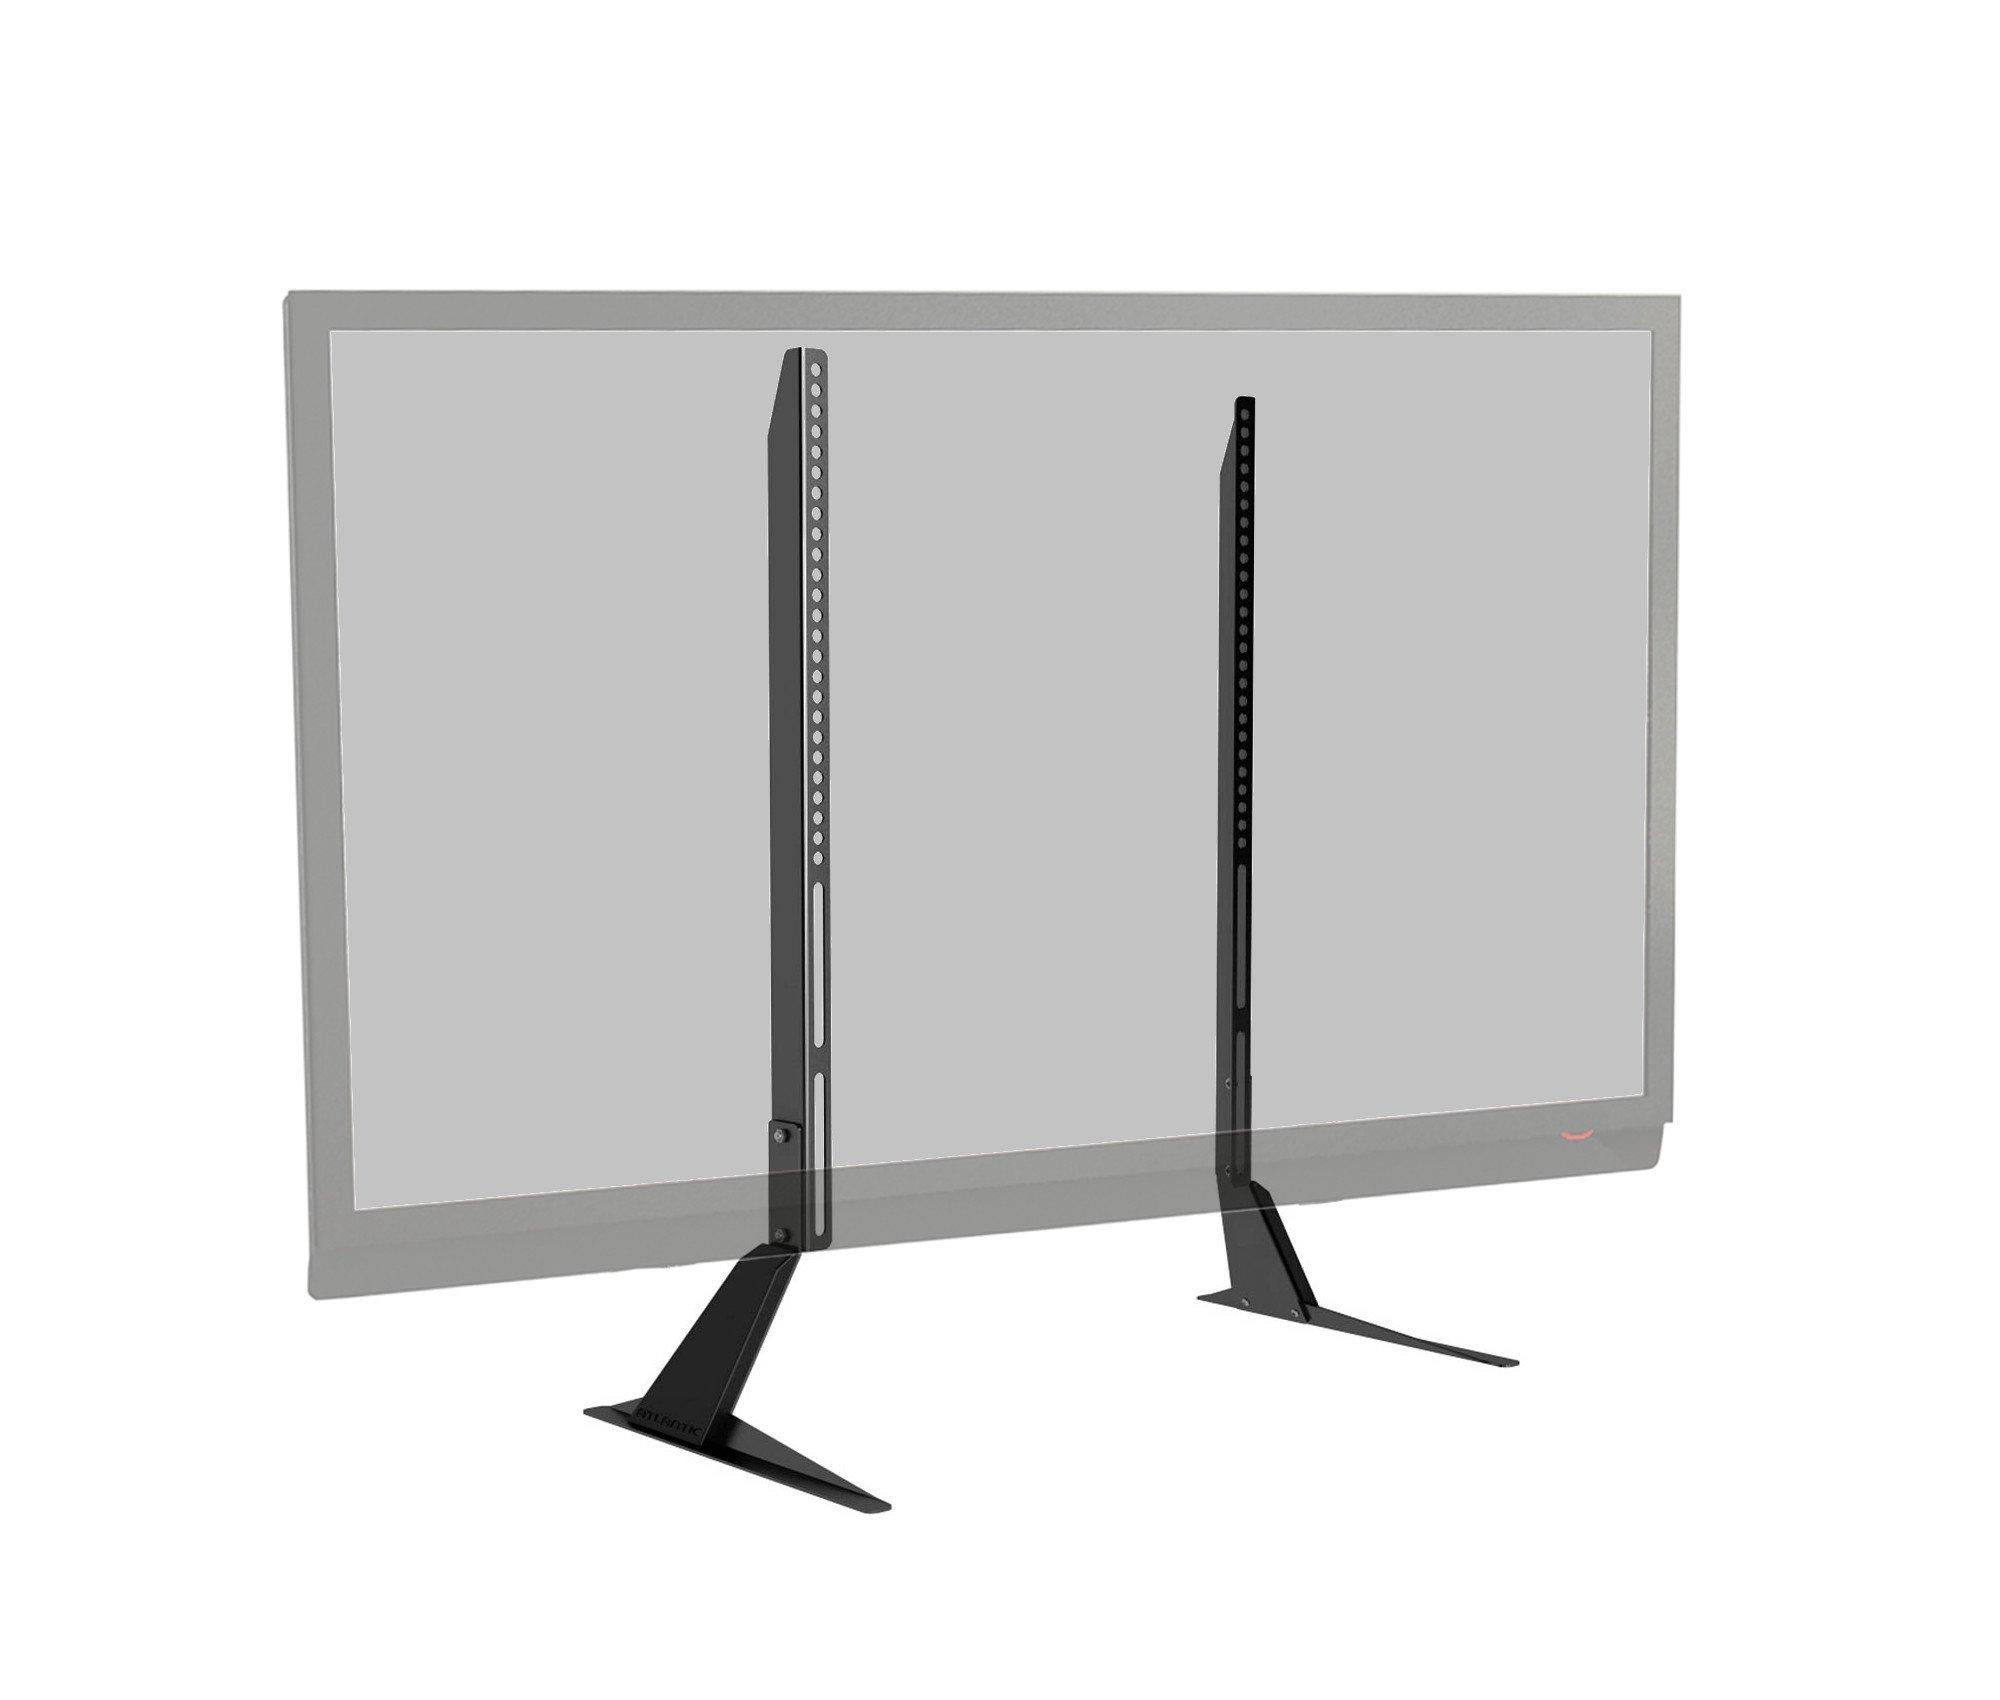 atlantic universal table top tv stand base mount for. Black Bedroom Furniture Sets. Home Design Ideas